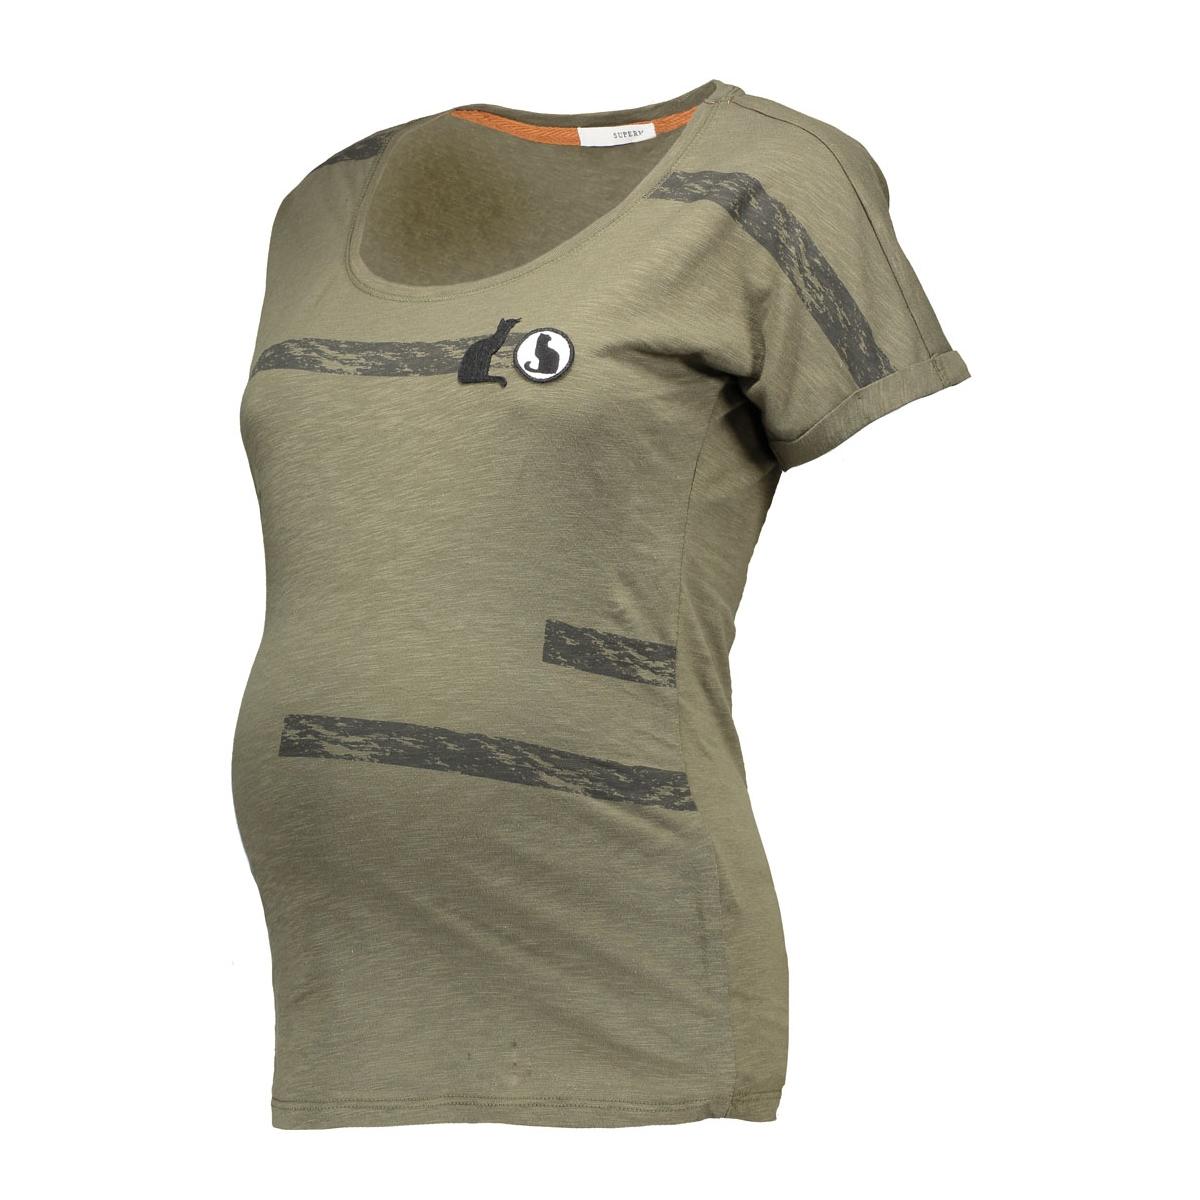 s0347 tee army supermom positie shirt c205 dark army